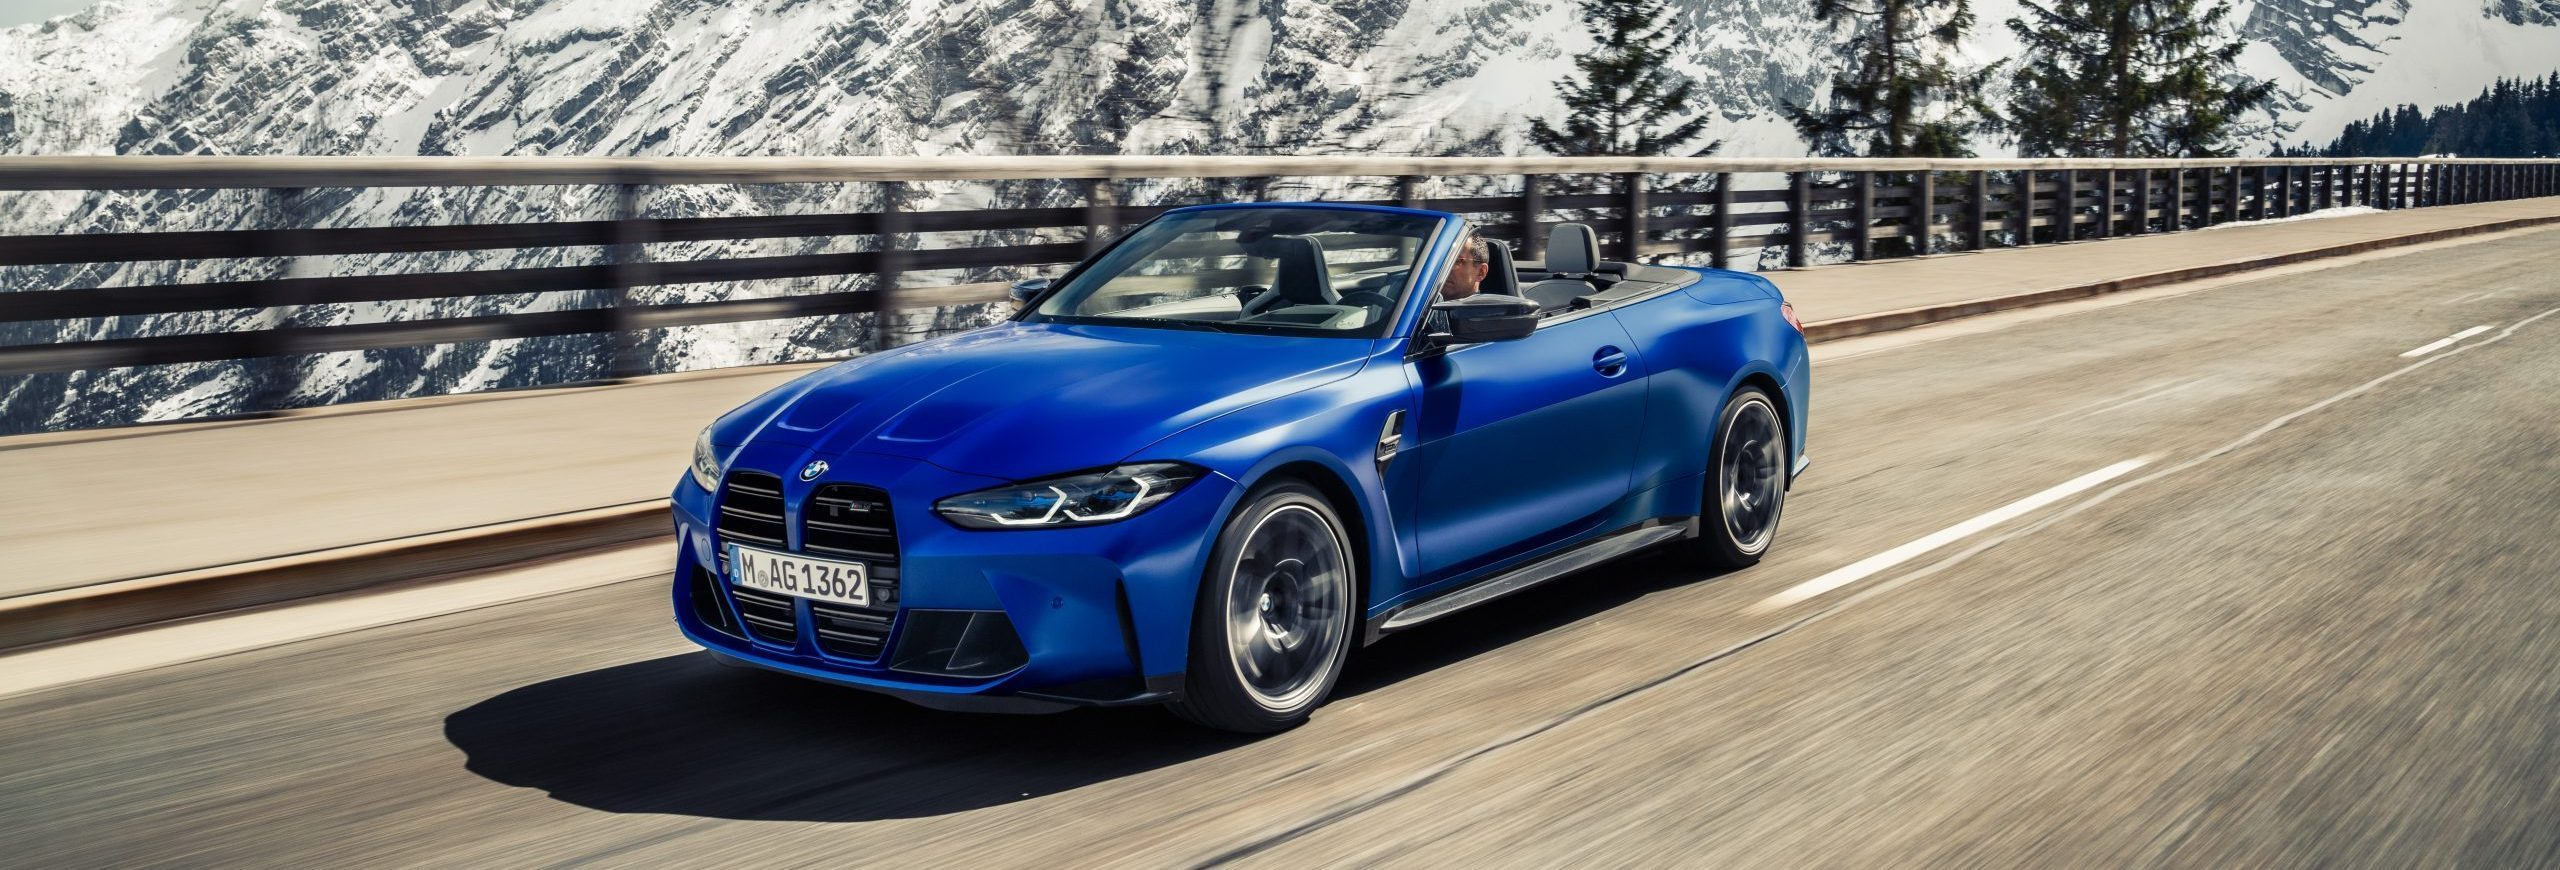 De nieuwe BMW M4 Competition Cabrio